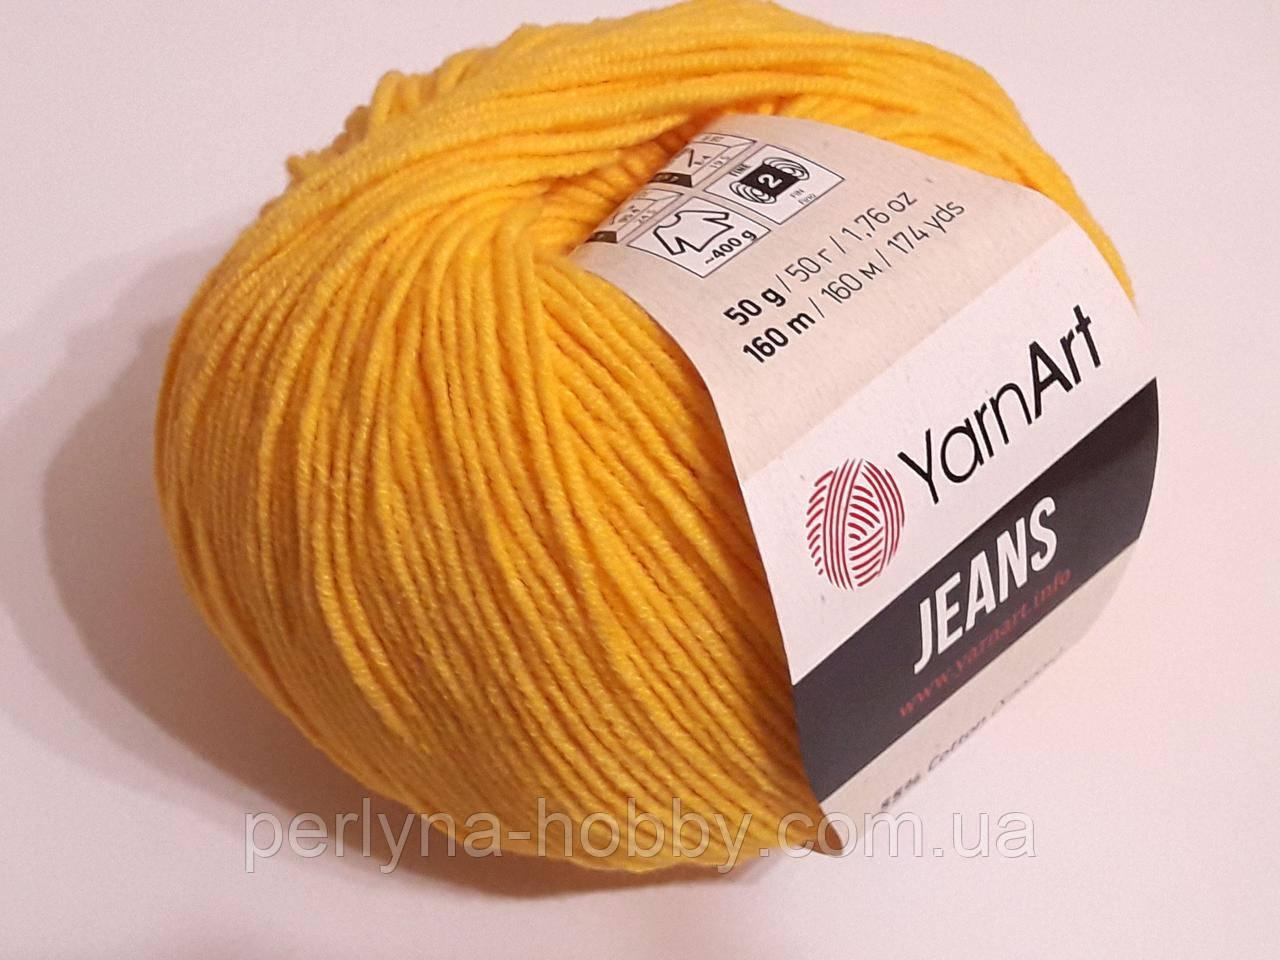 Пряжа YarnArt  Jeans Ярнарт Джинс нитки для вязания 50 гр, 160 м,  хлопок / акрил. Жовта гаряча 035